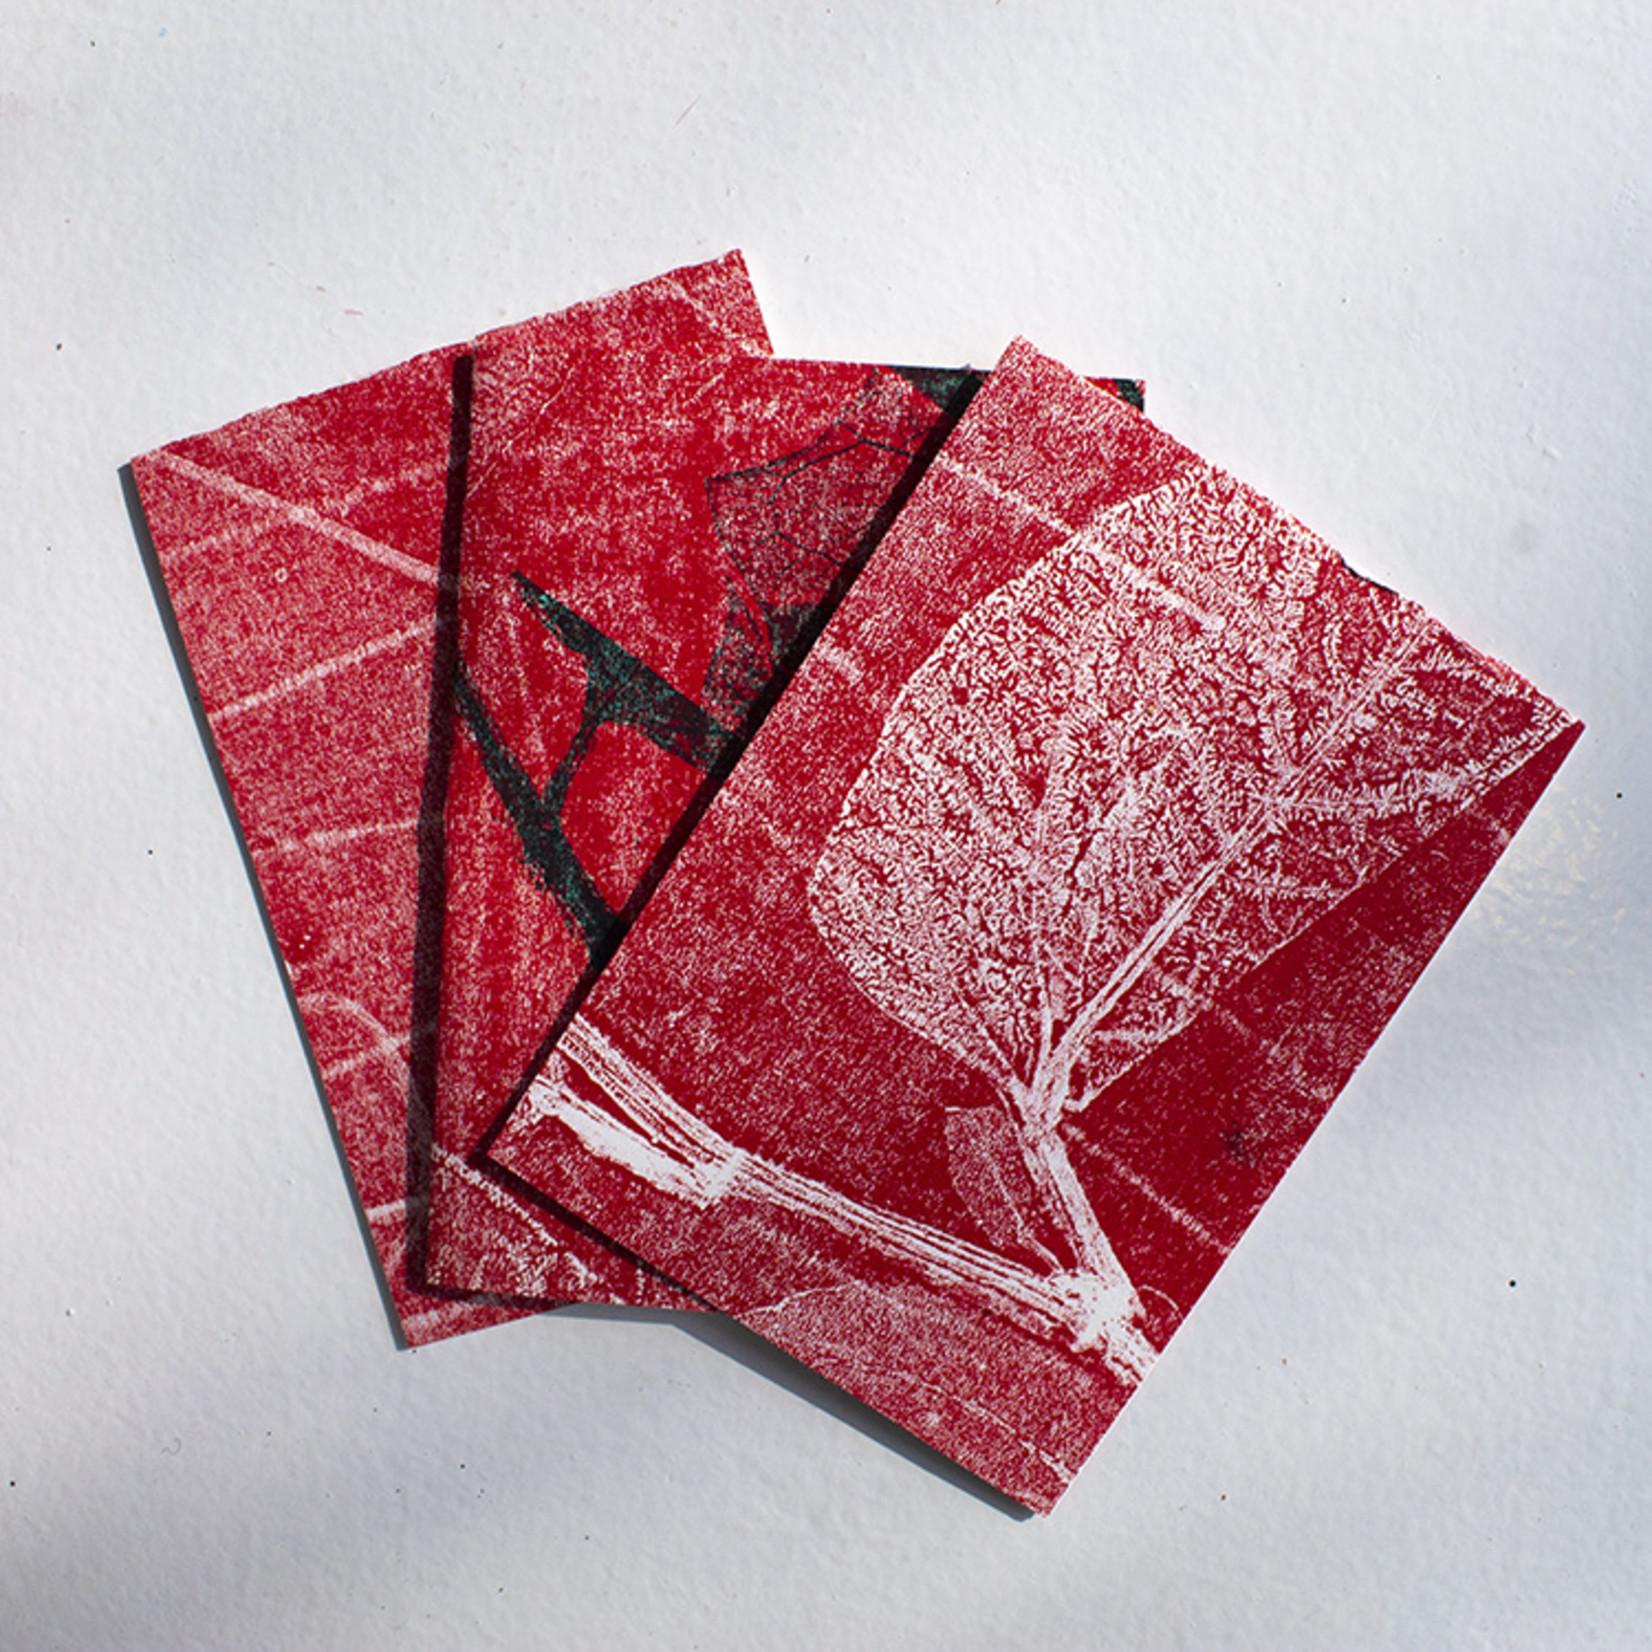 Roos Terra Handgedrukte postkaarten van Roos Terra